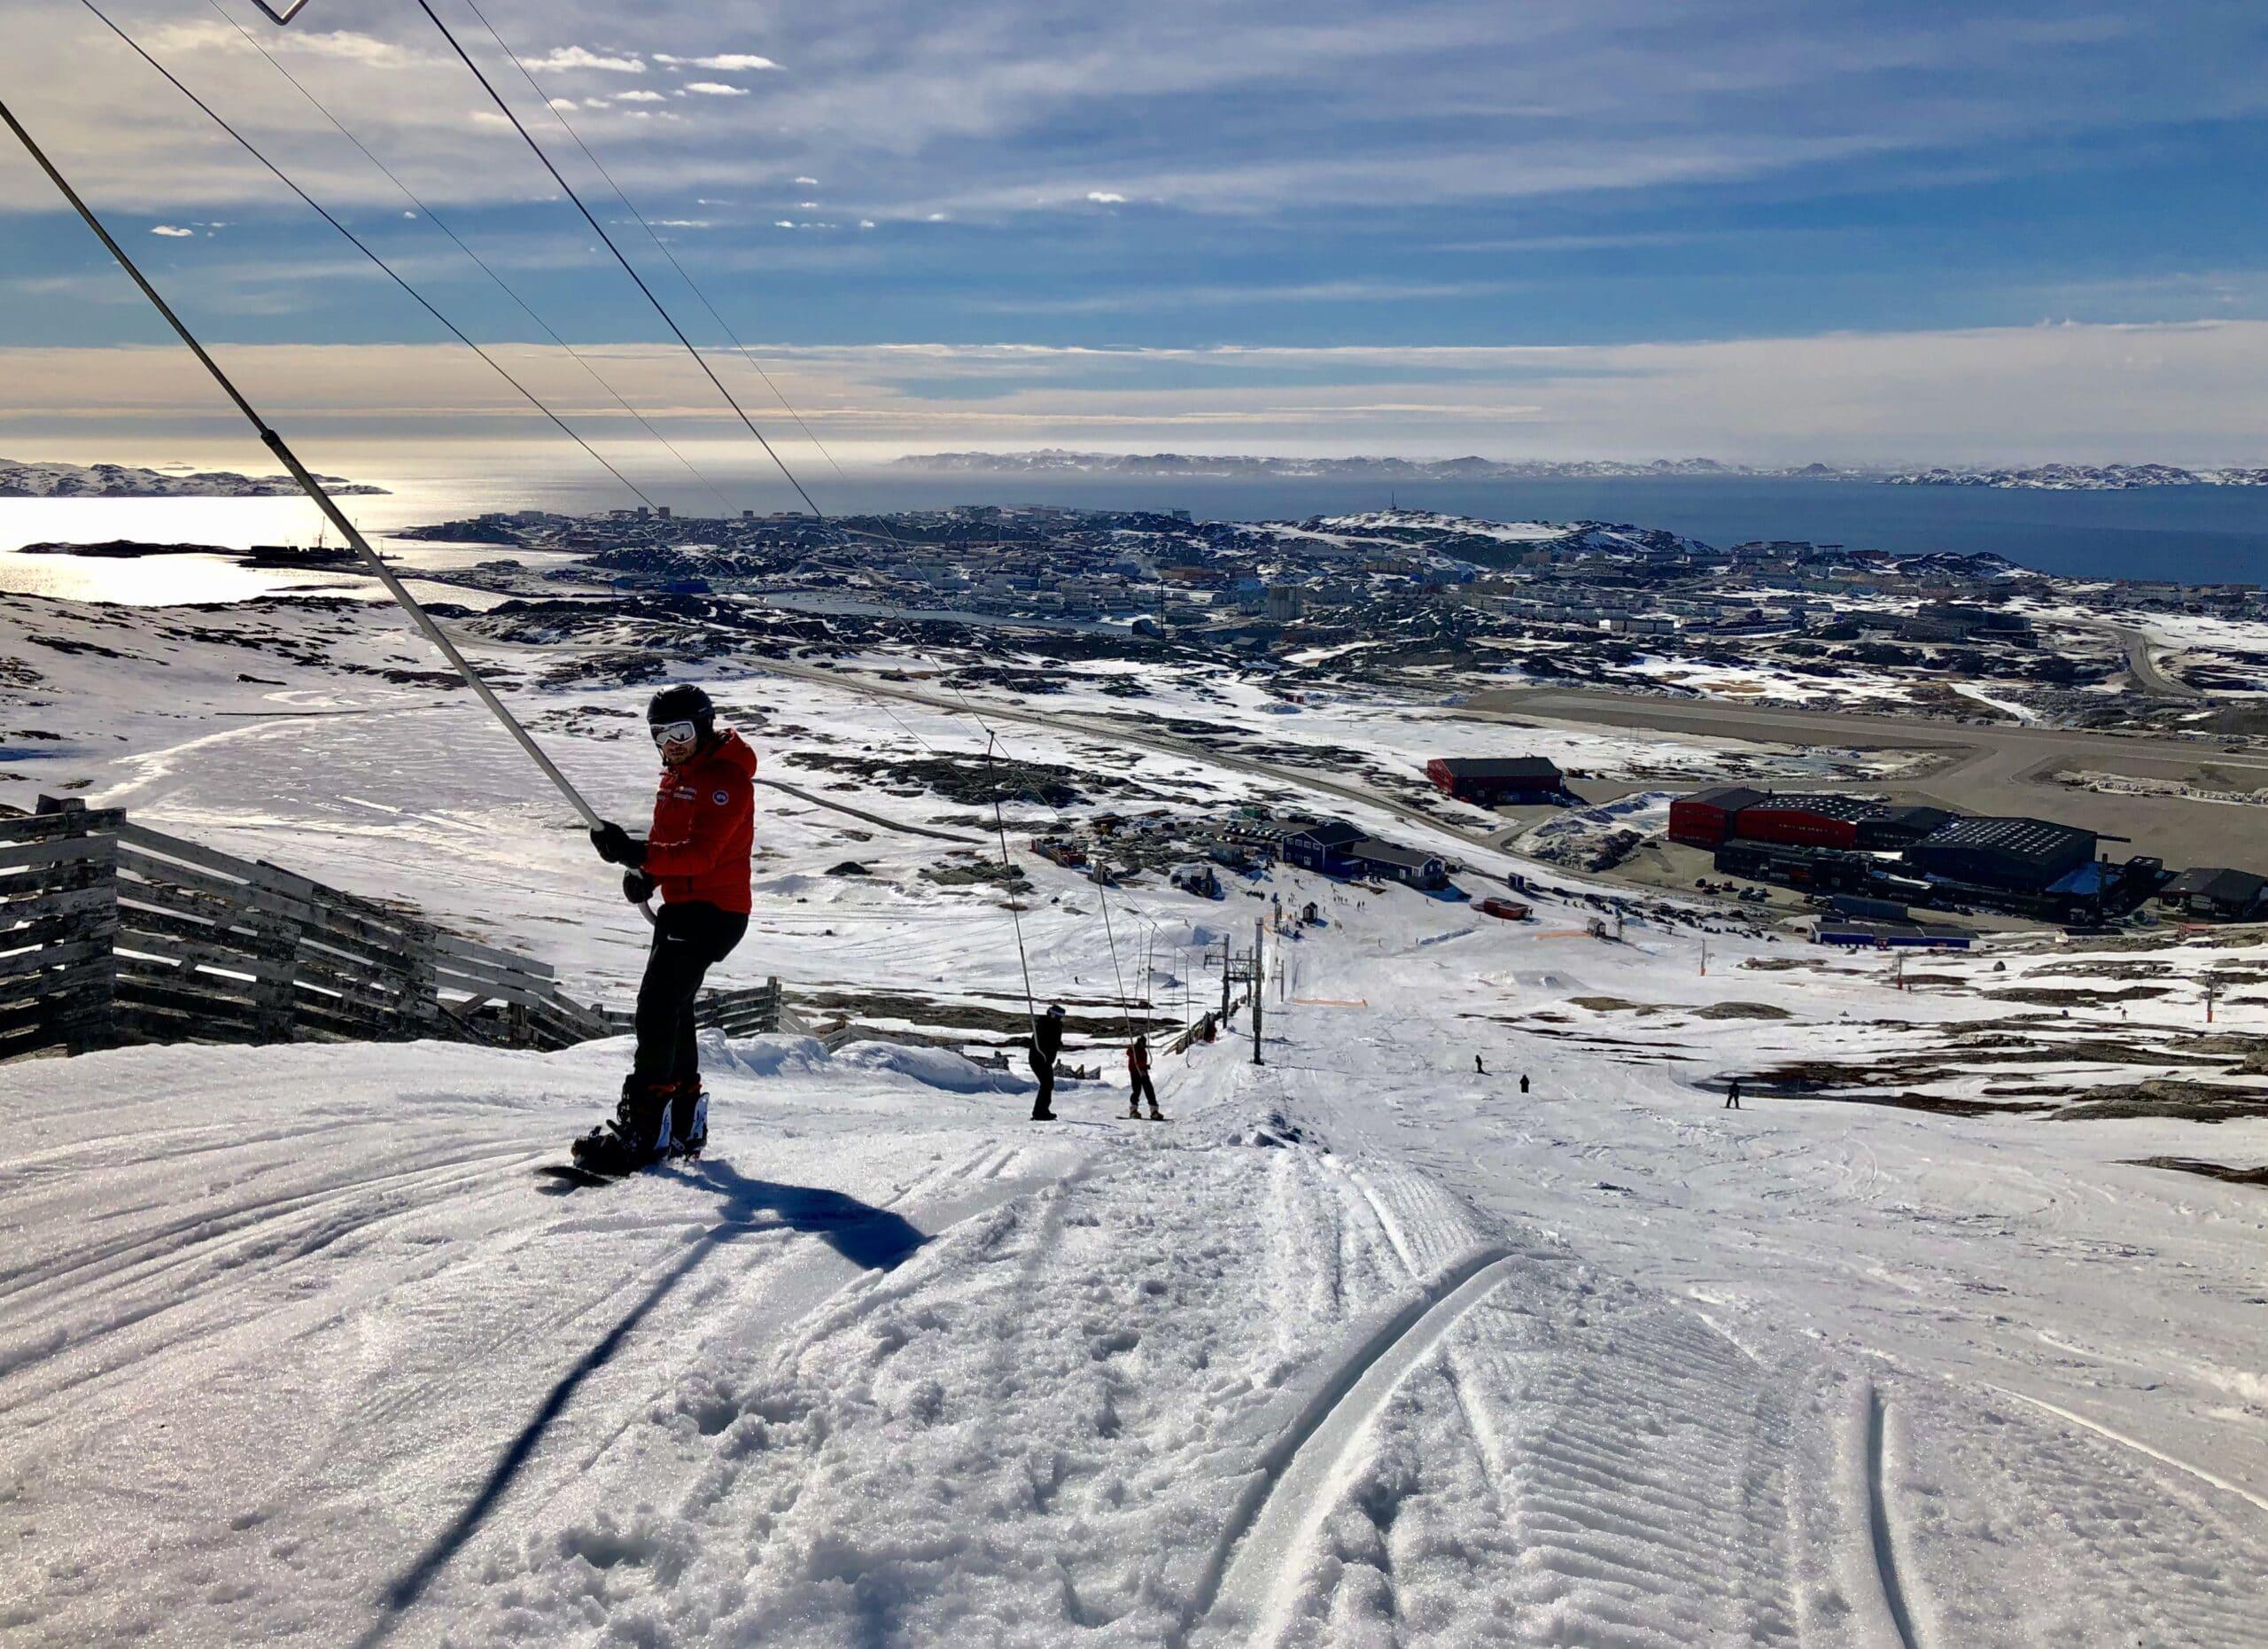 Ski slope – Nuuk